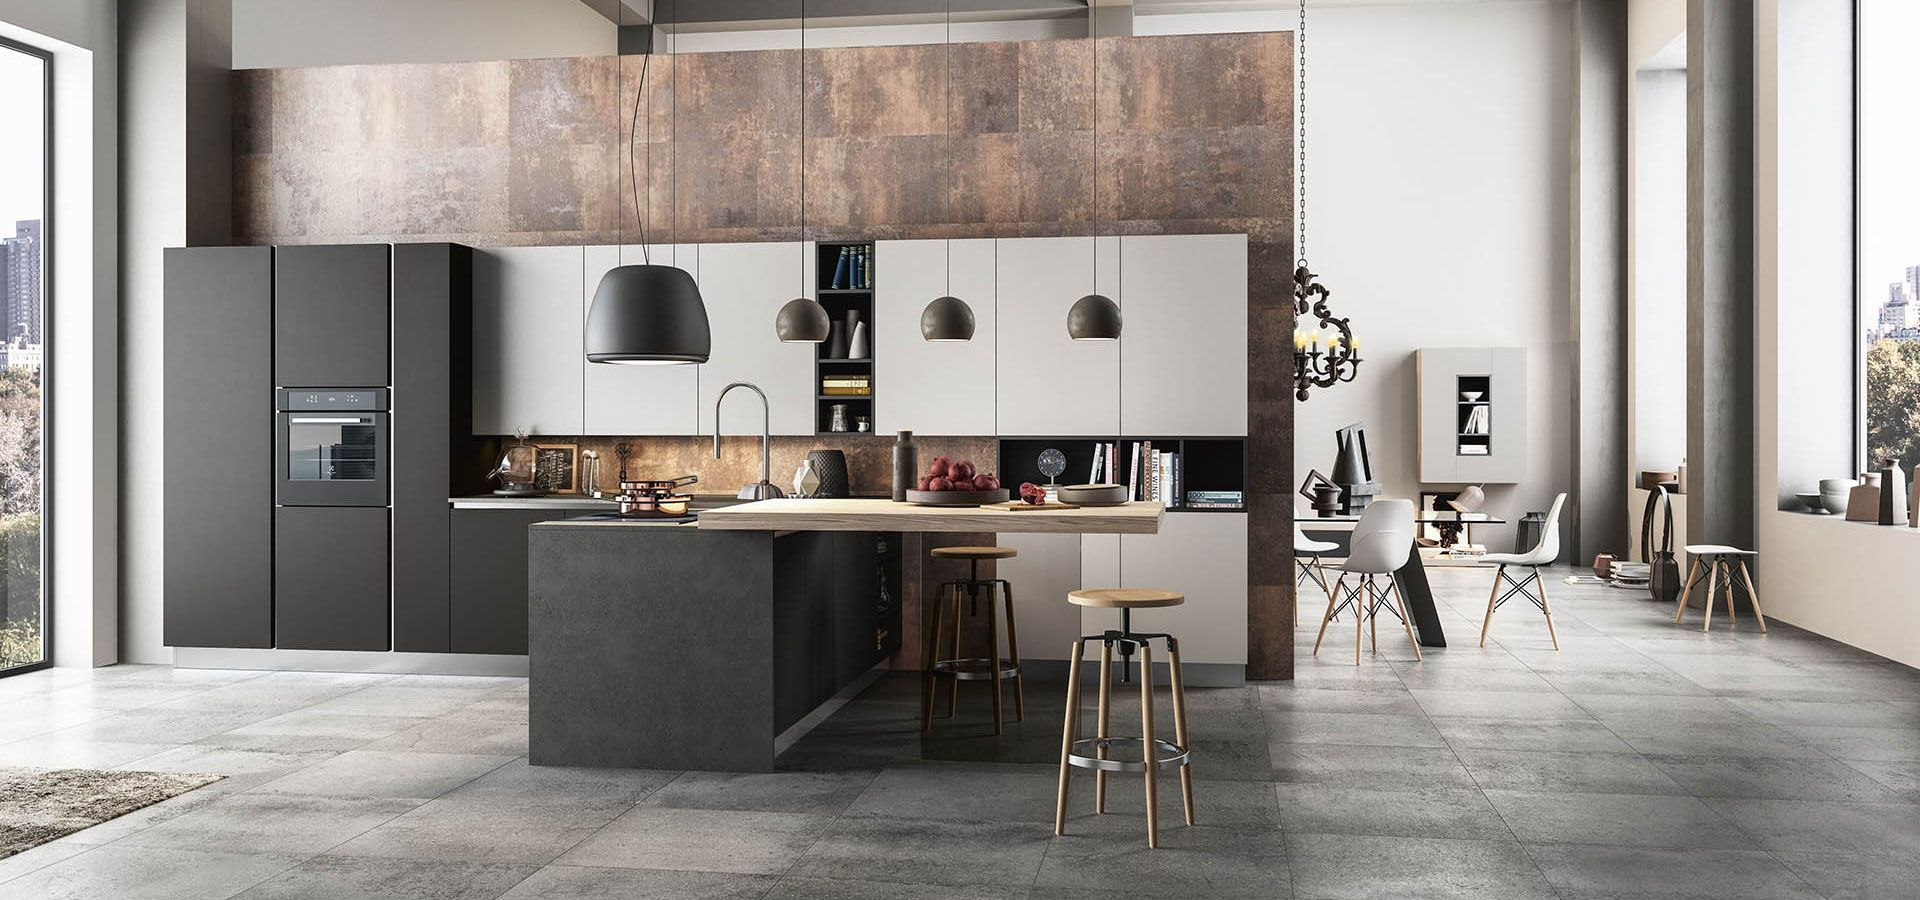 Cucina Moderna - Time Finiture: nero opaco, nebbia opaco  Top laminato porfido nero  Piano ...